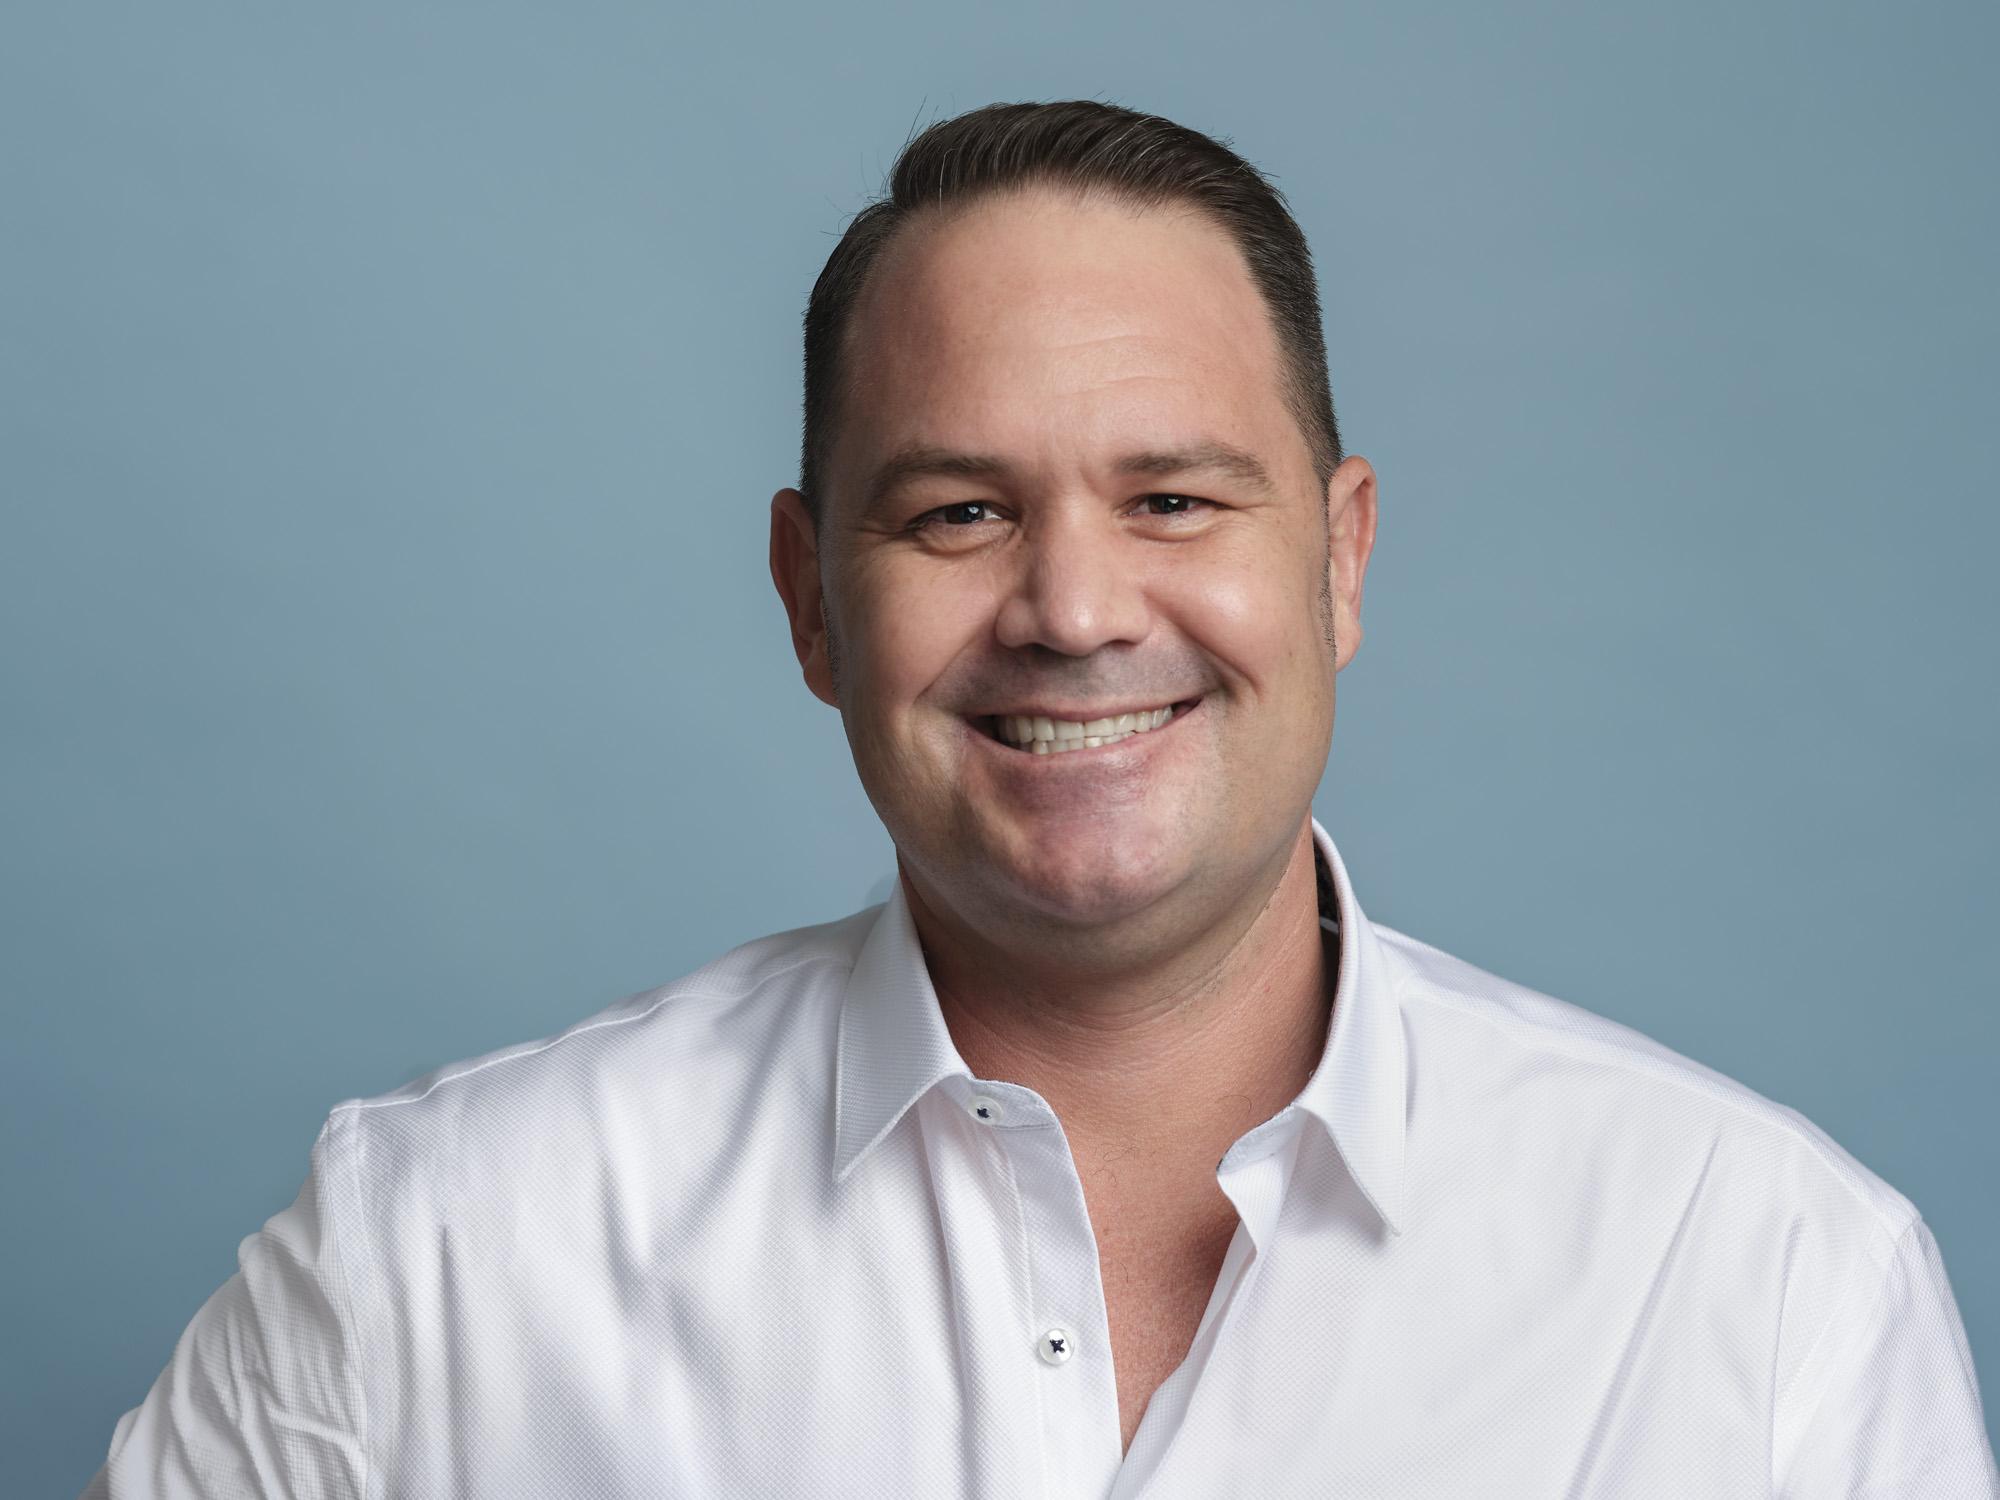 Jason Novobranec Implementary Chief Operating Officer